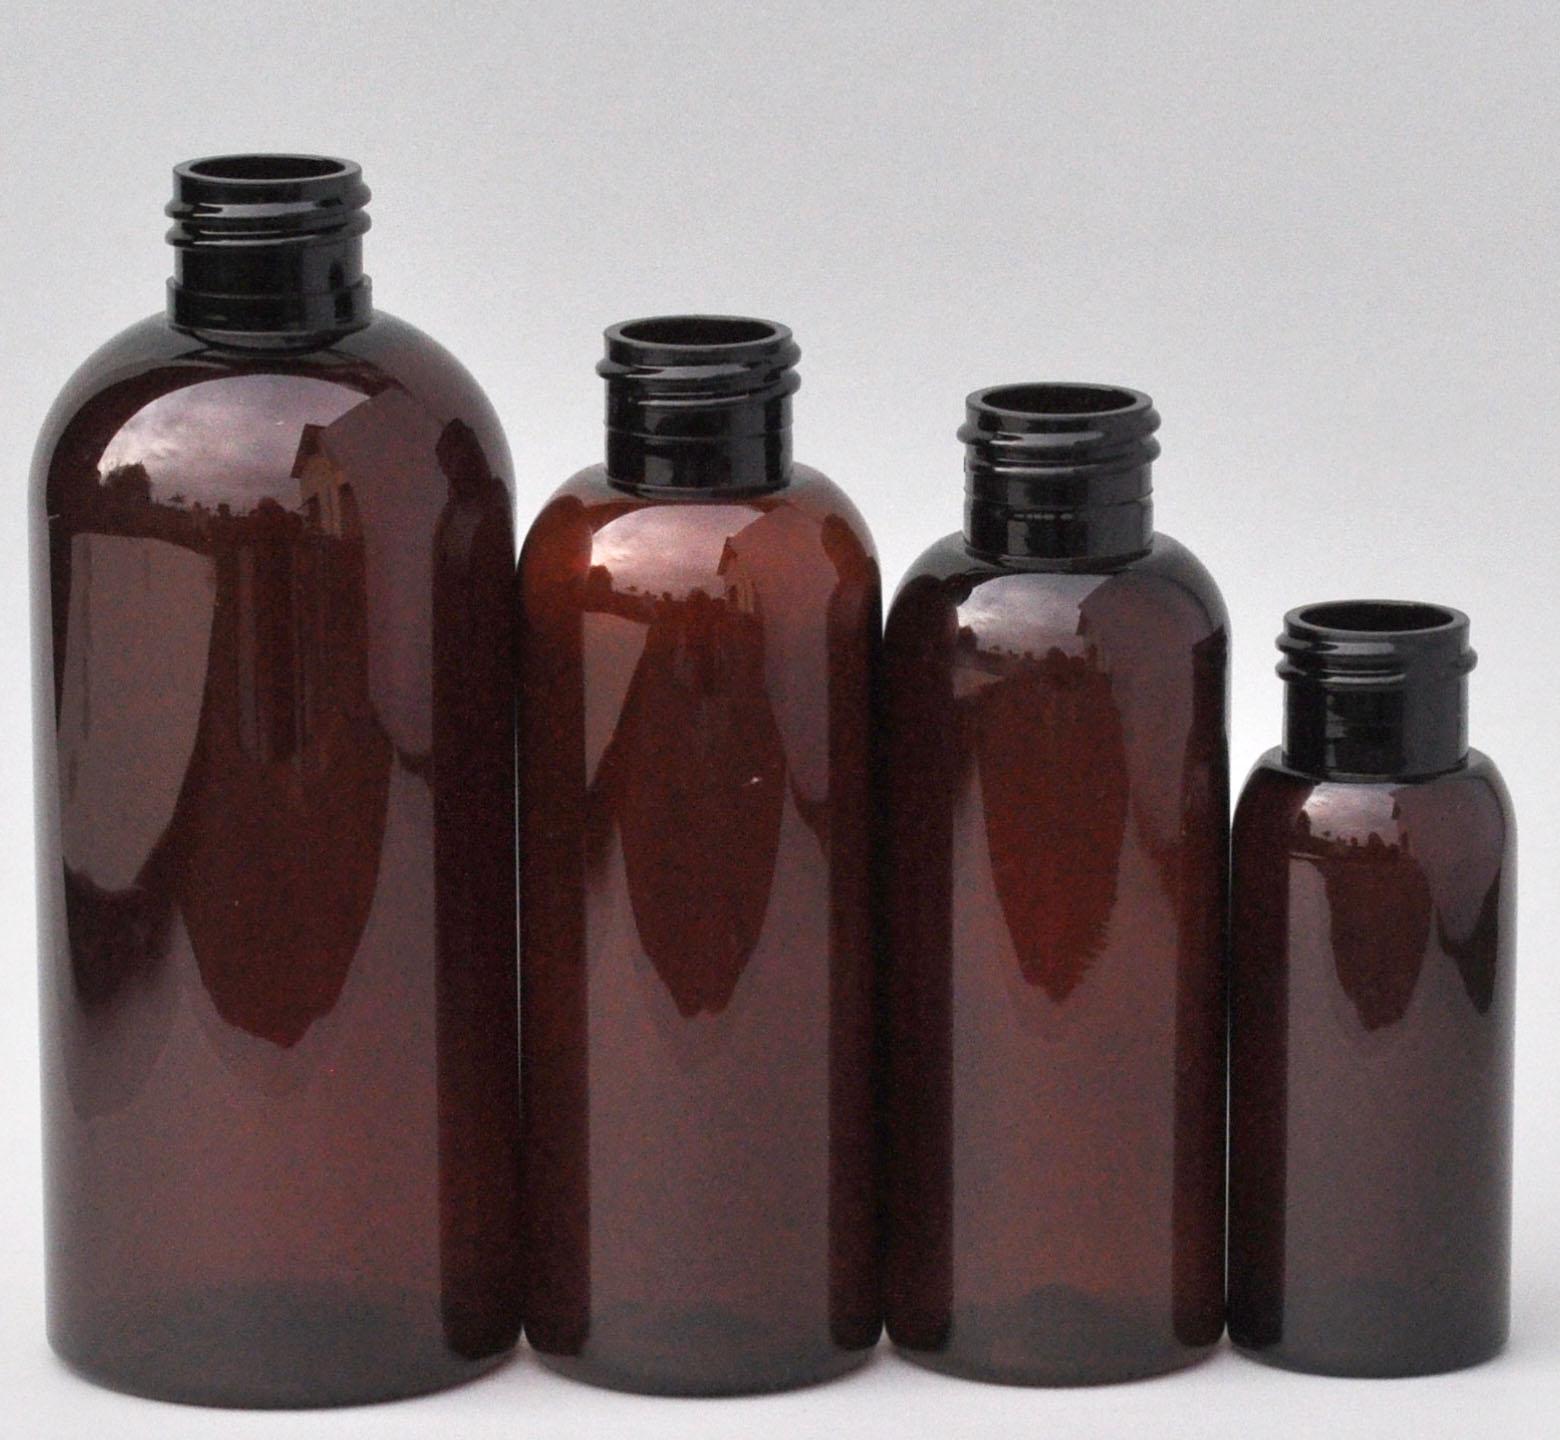 SNEP-250BPETA-250ml Amber PET Boston Bottle with 24/410 Neck